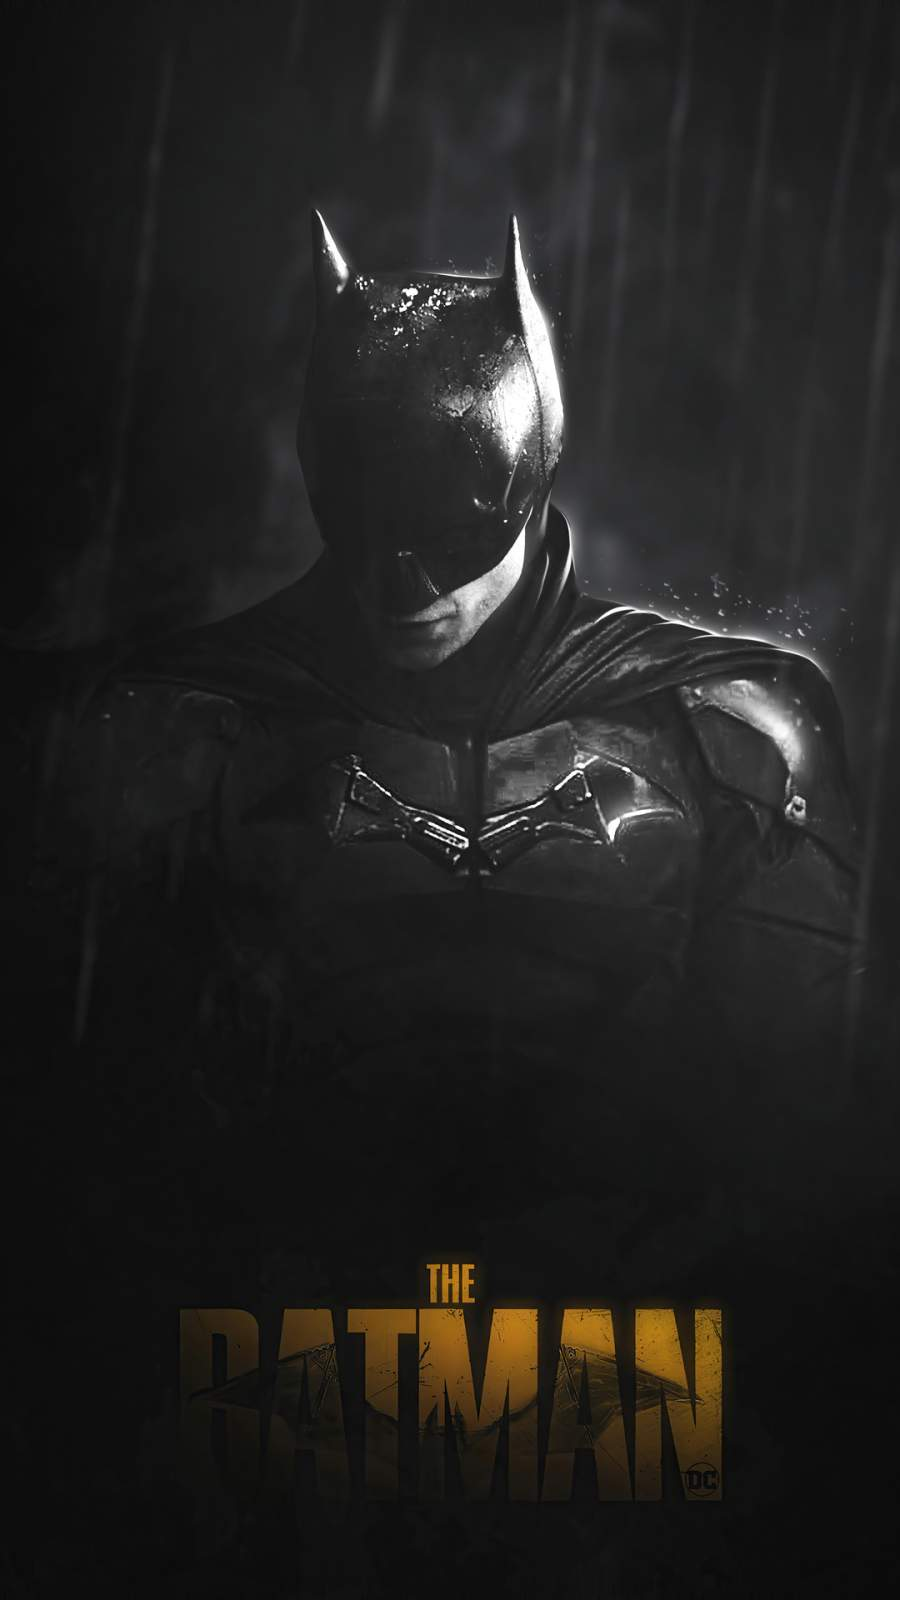 The Batman Monochrome iPhone Wallpaper